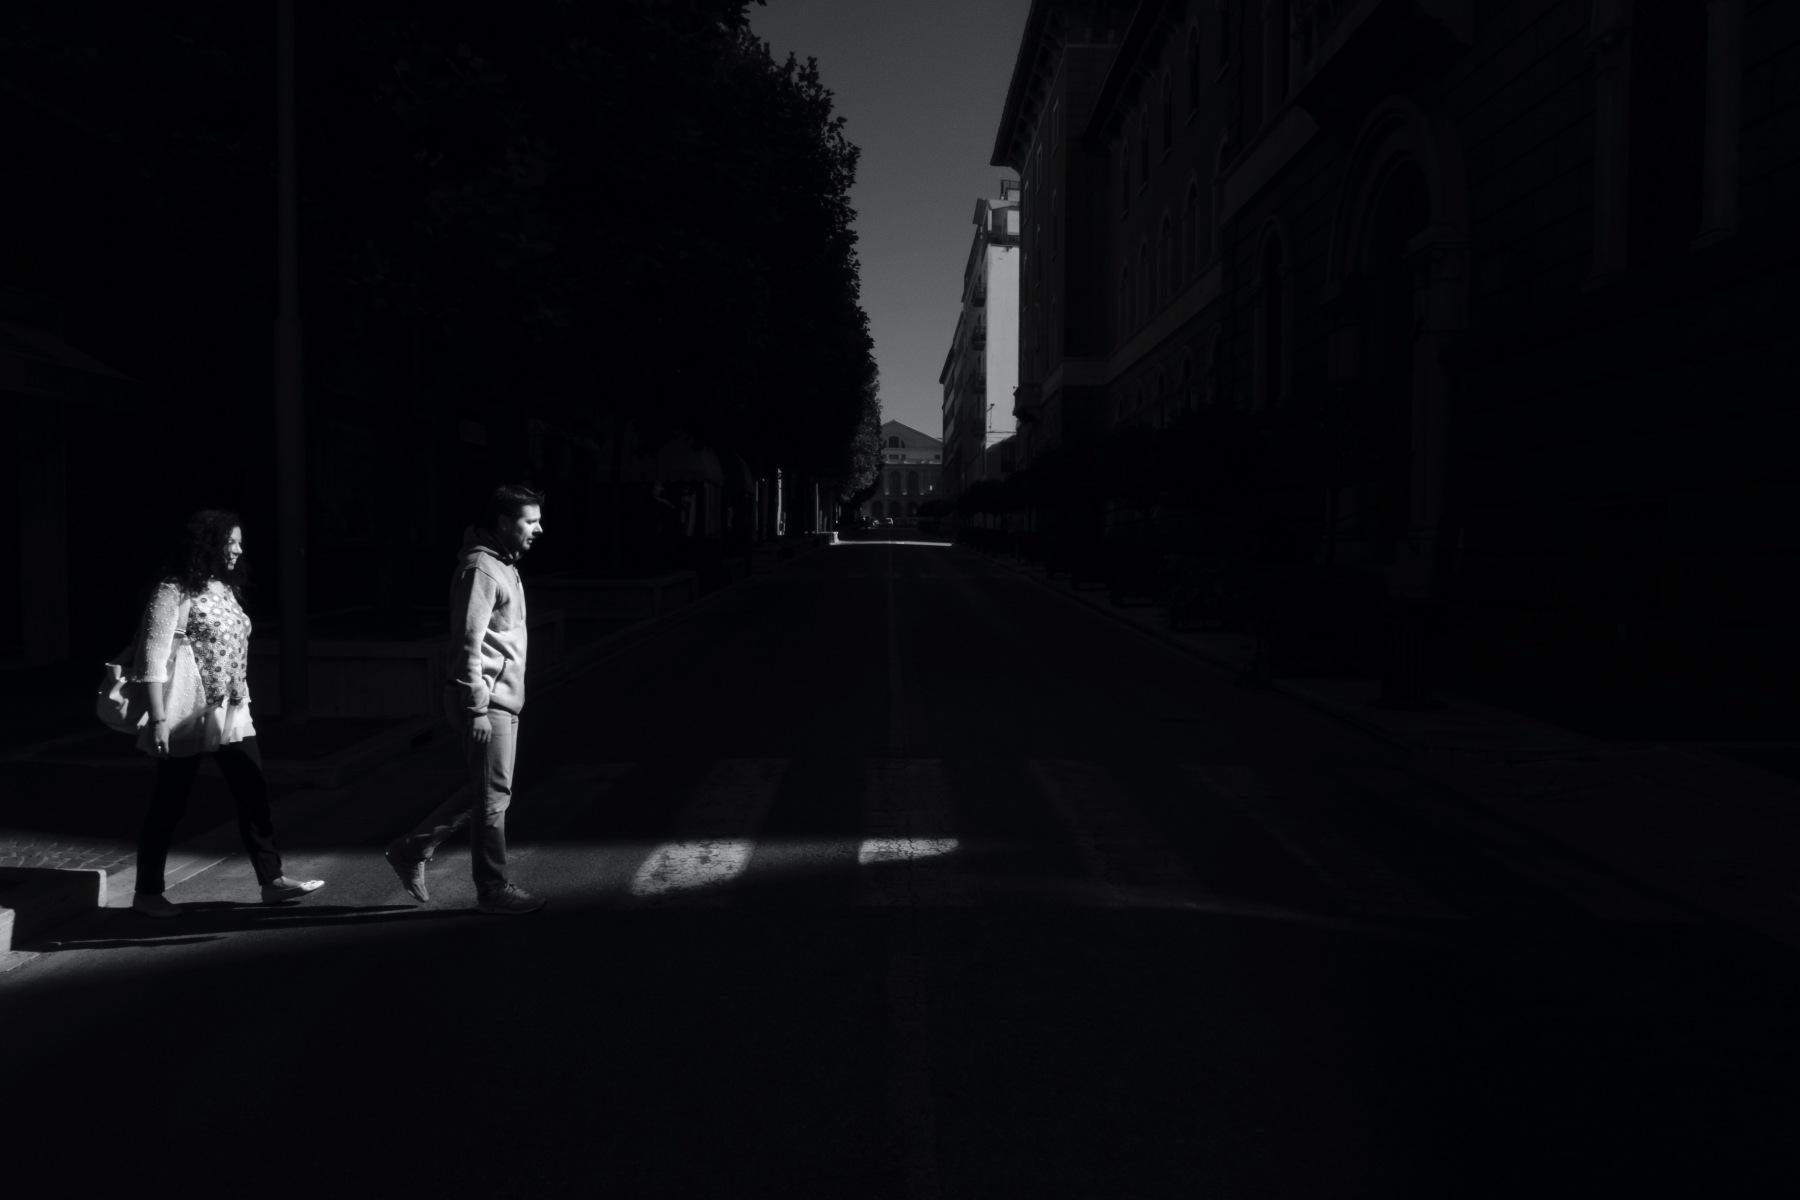 streetcrossing_publish